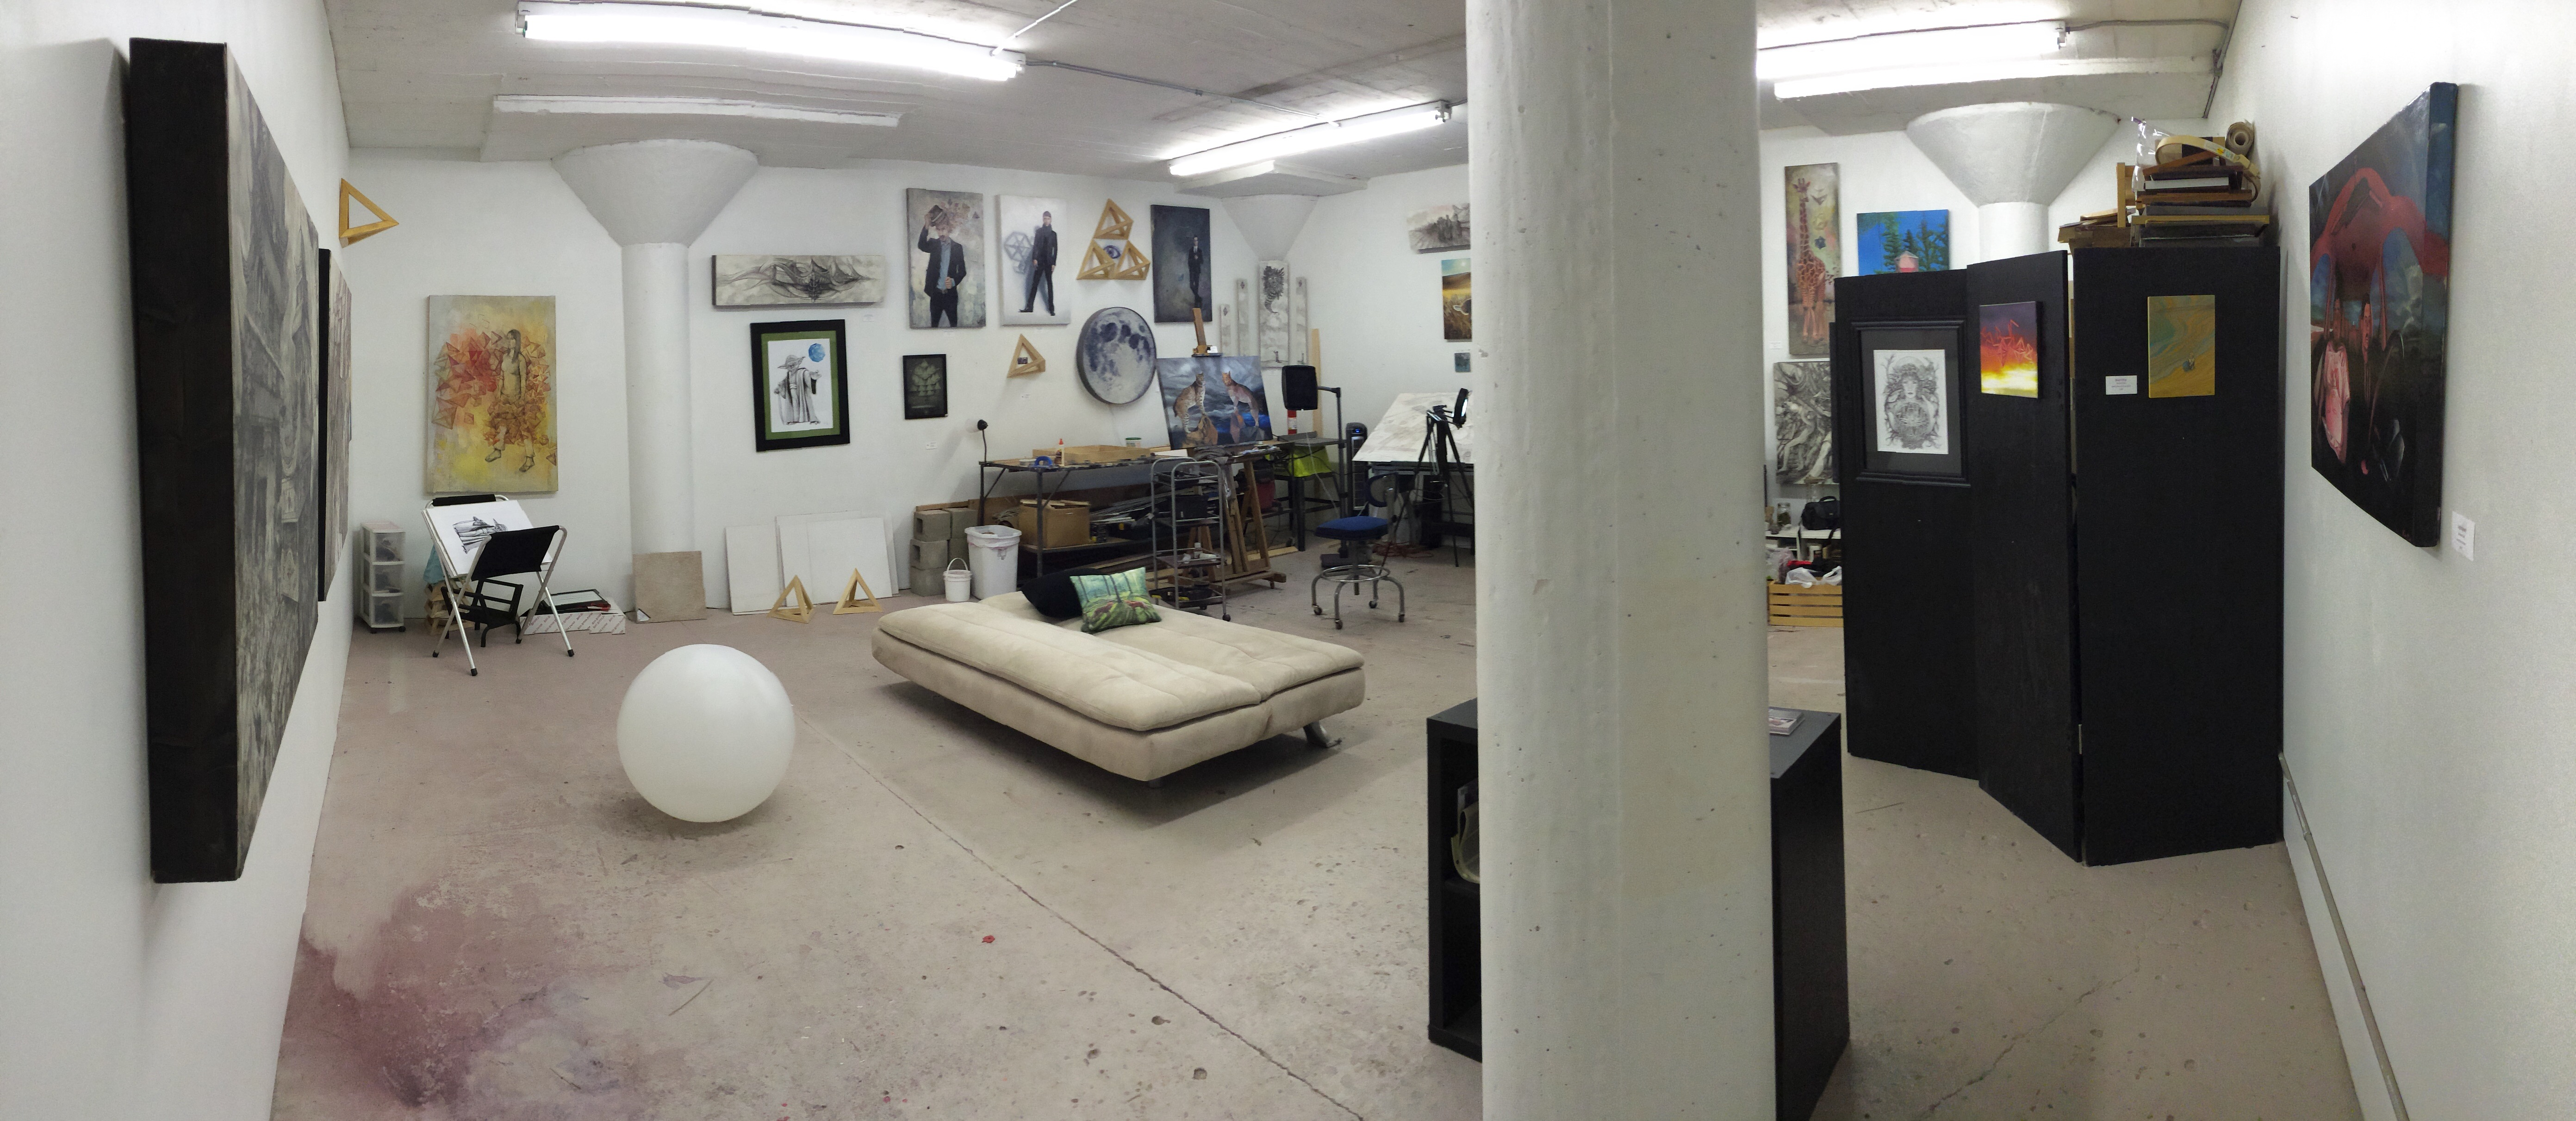 Studio B8